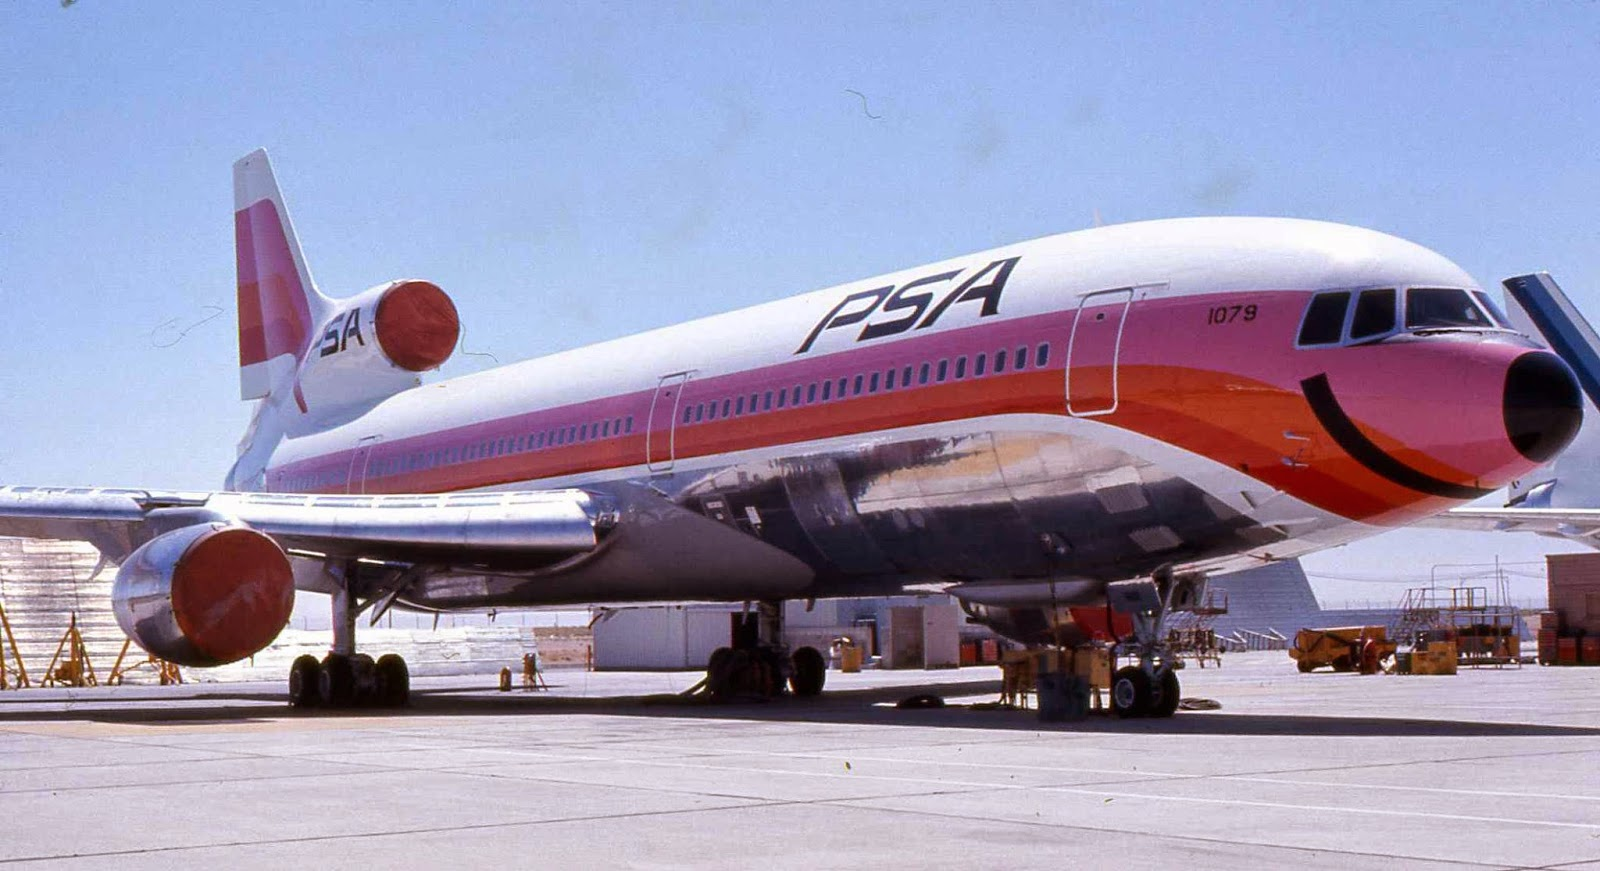 Pasajero de Southwest Airlines ahora posando desnuda